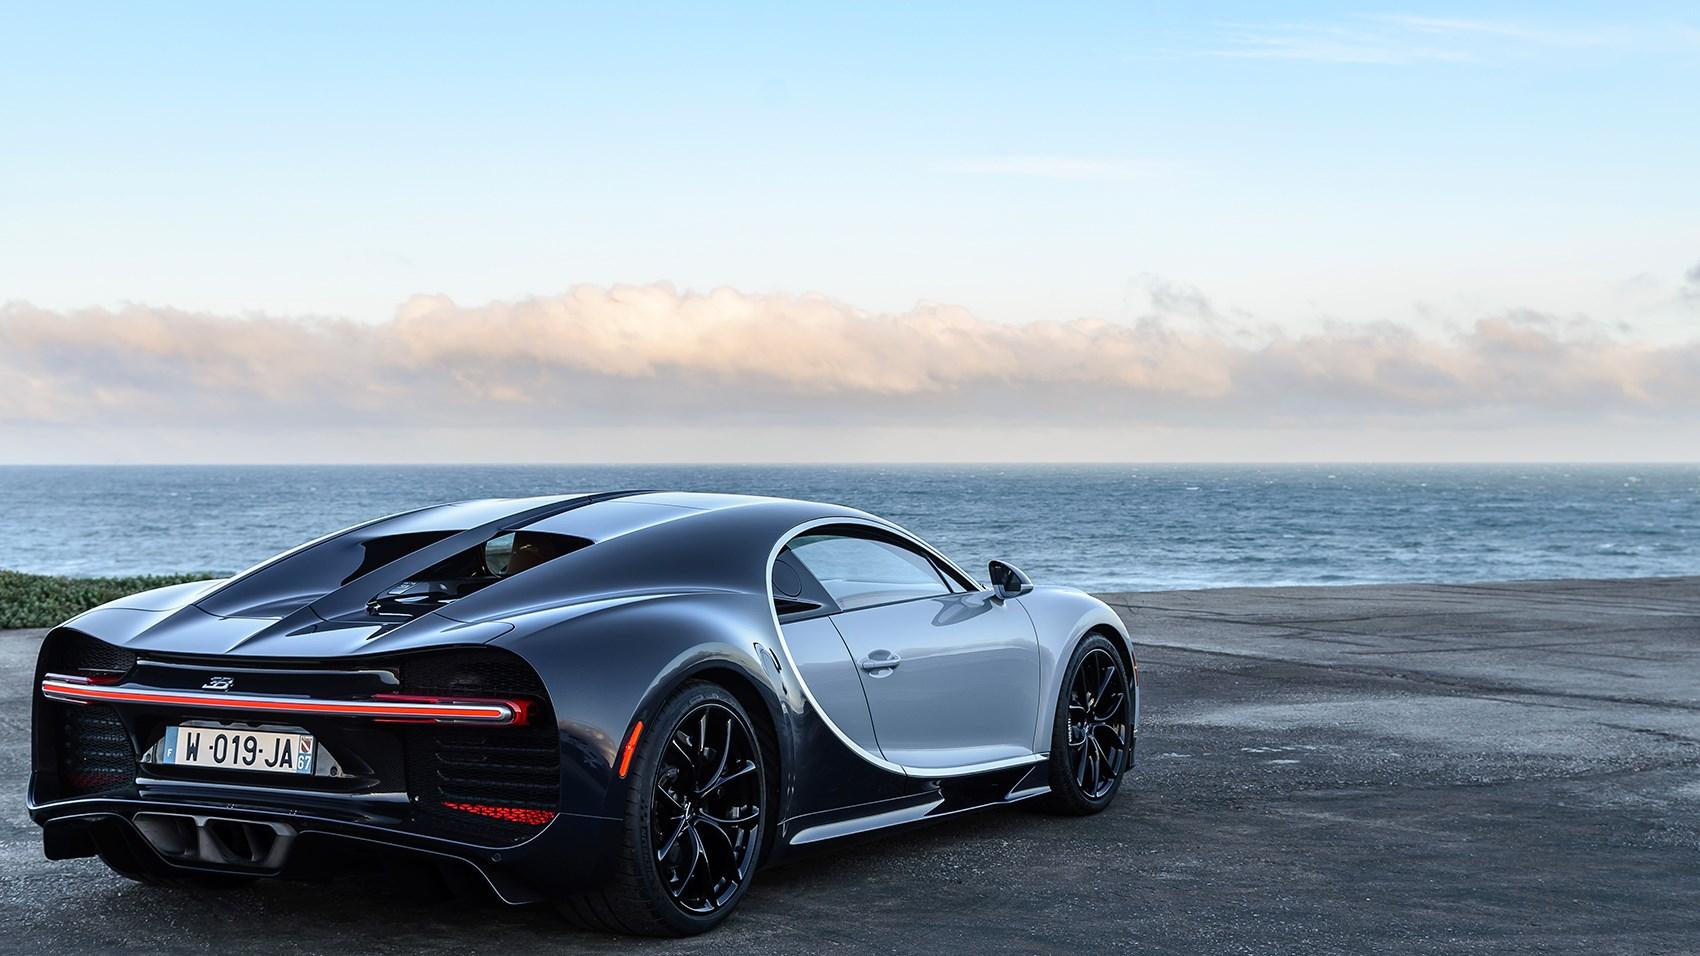 4 место Bugatti Chiron – 2,99 миллиона долларов